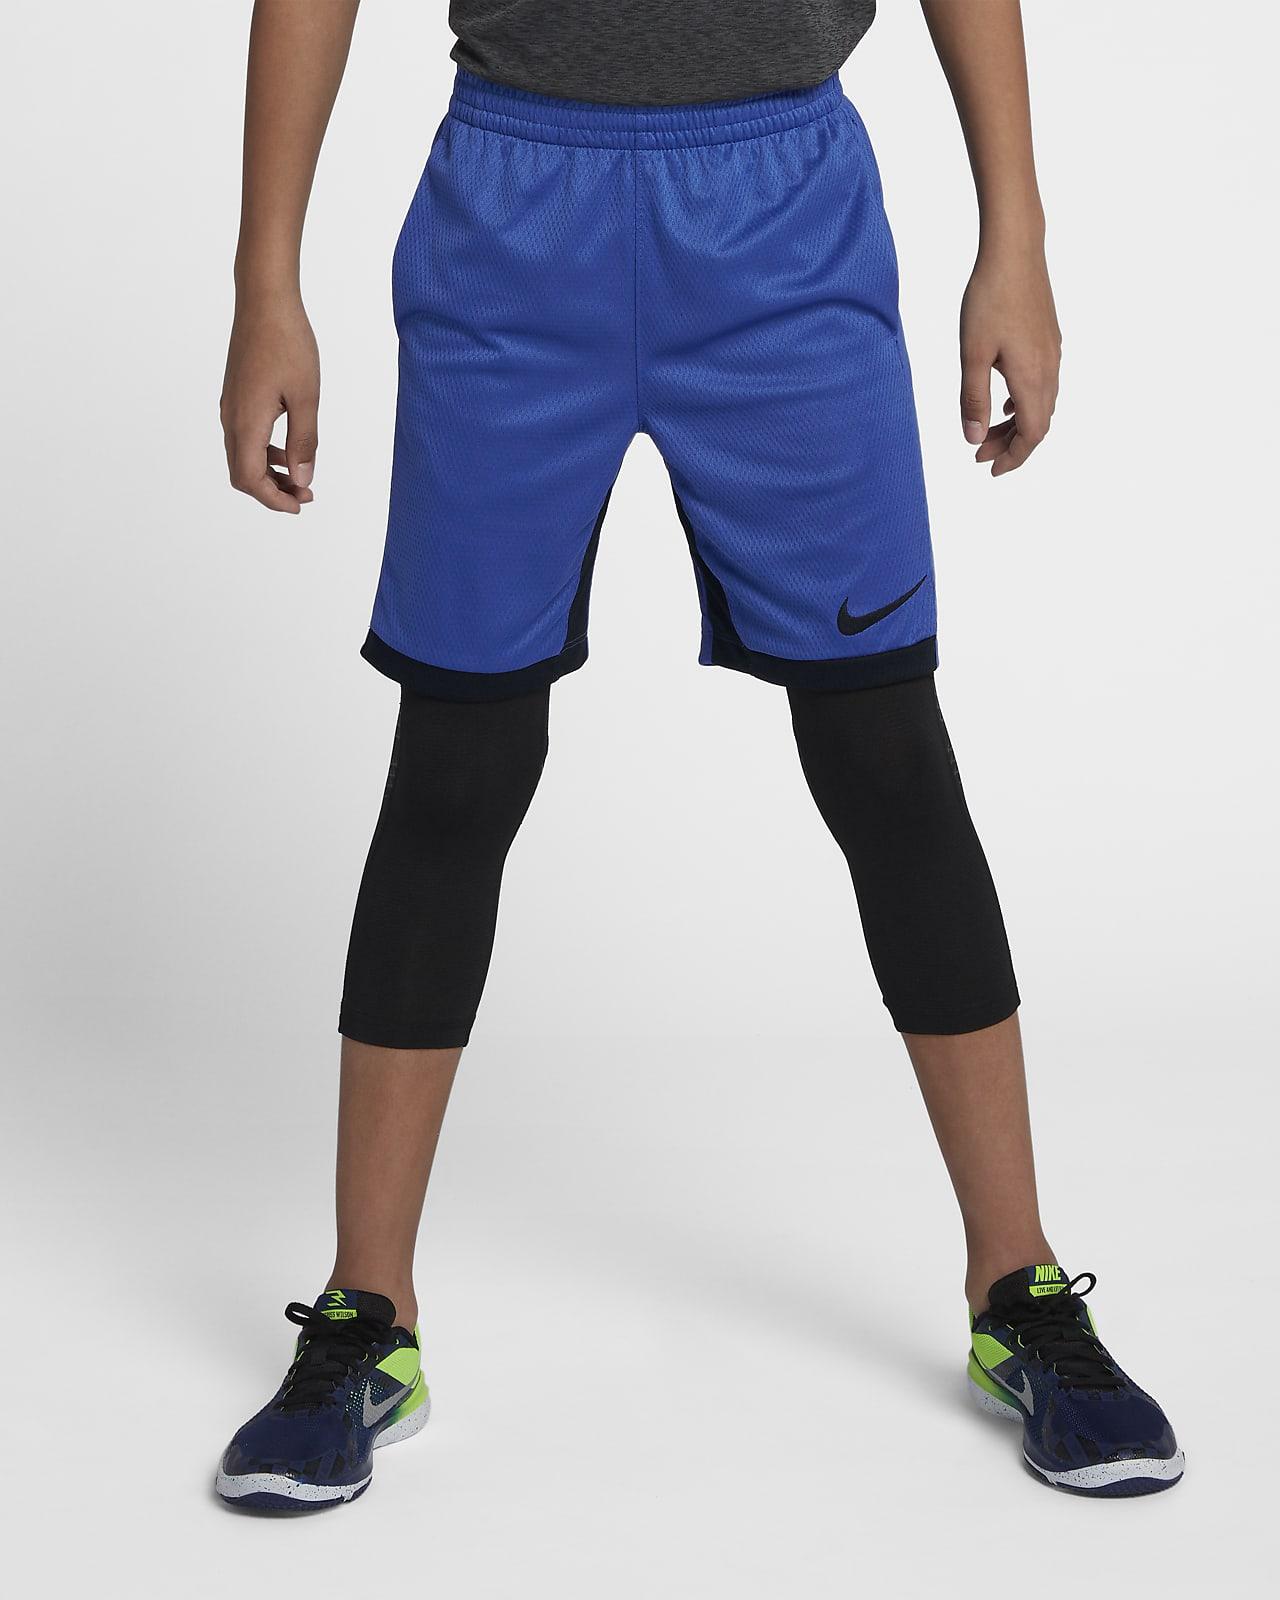 Nike Dri-FIT Trophy Older Kids' (Boys') Training Shorts